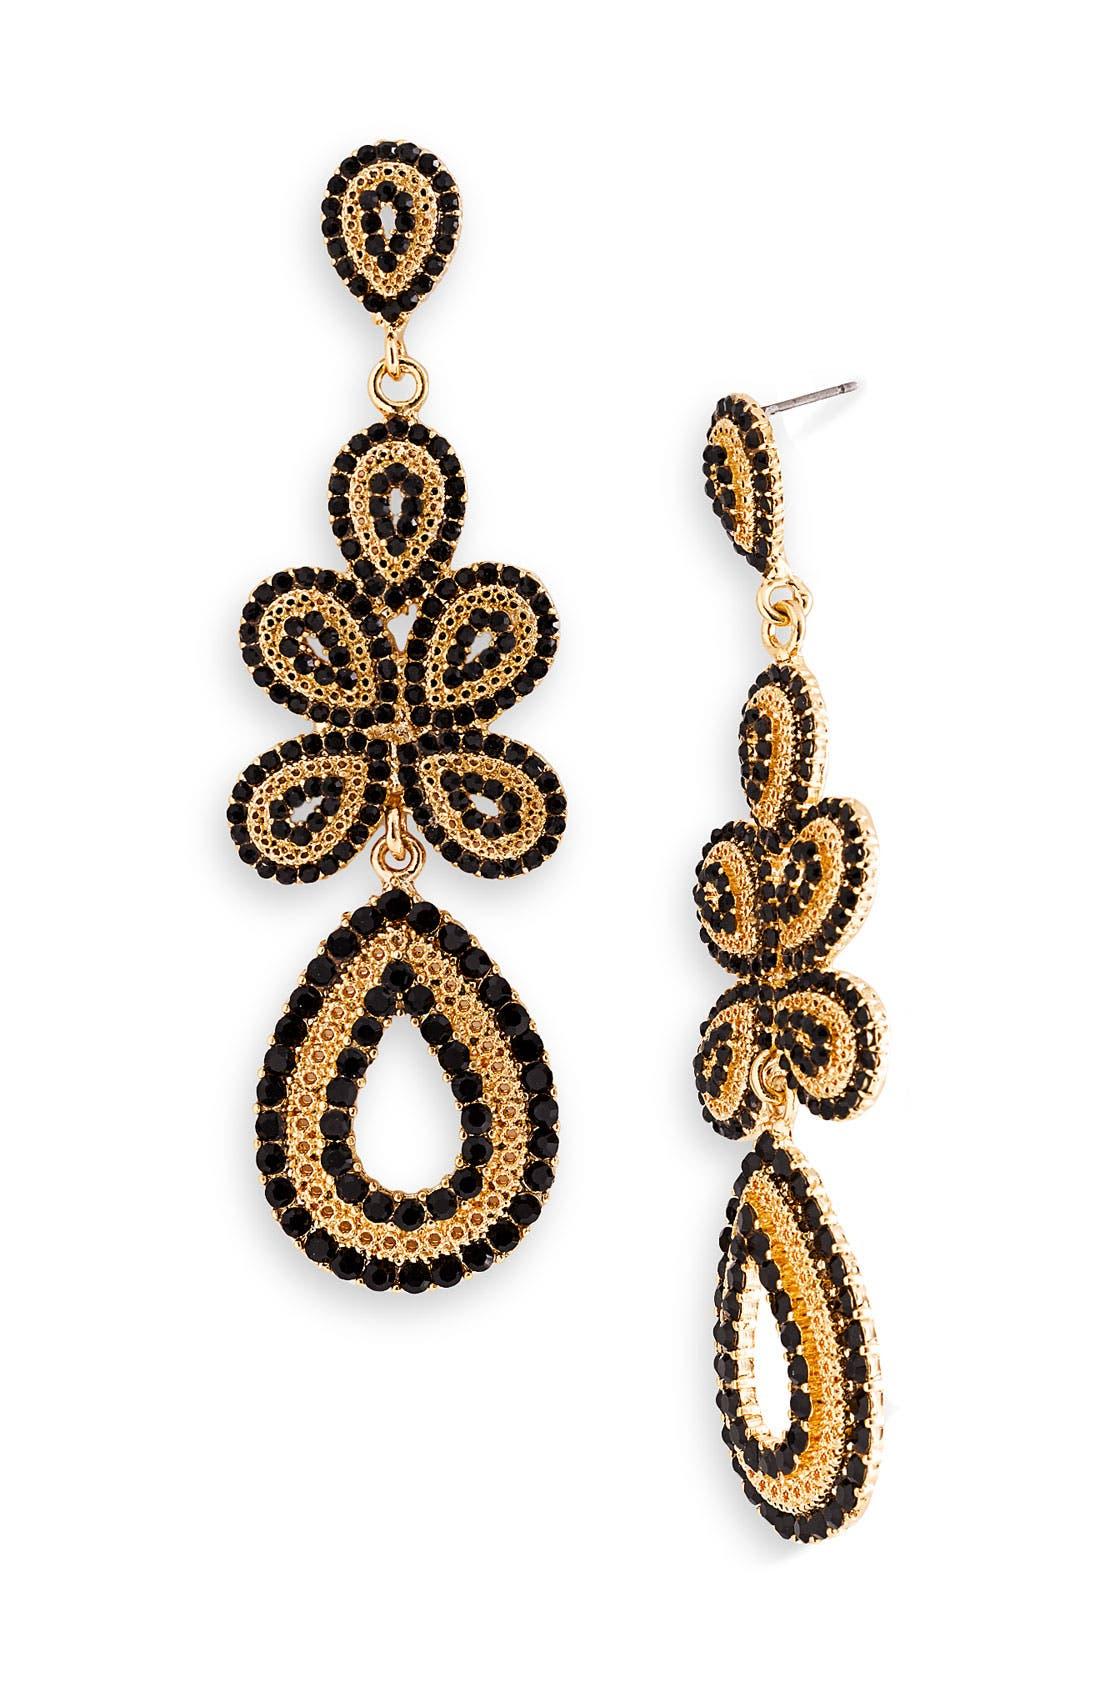 'Ornate' Linear Statement Earrings,                             Main thumbnail 1, color,                             001